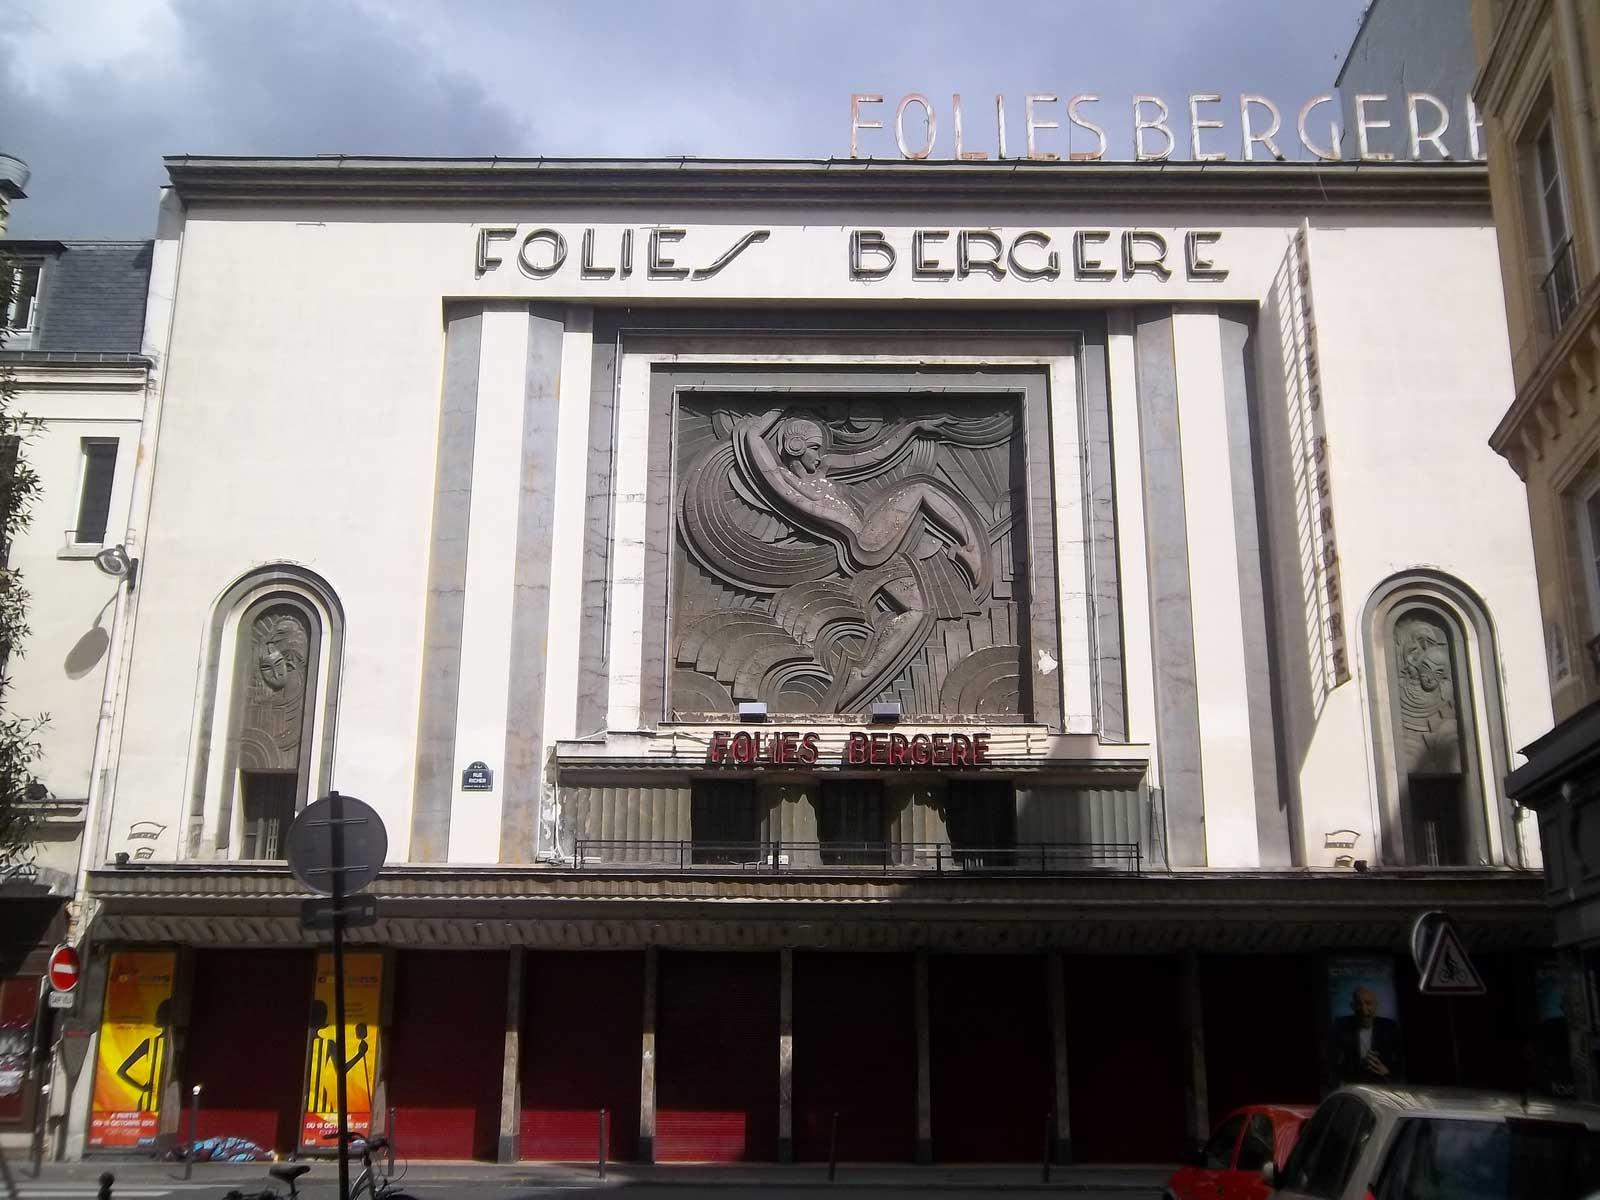 Appartement Folies Berg 232 Res Paris Studiom Building